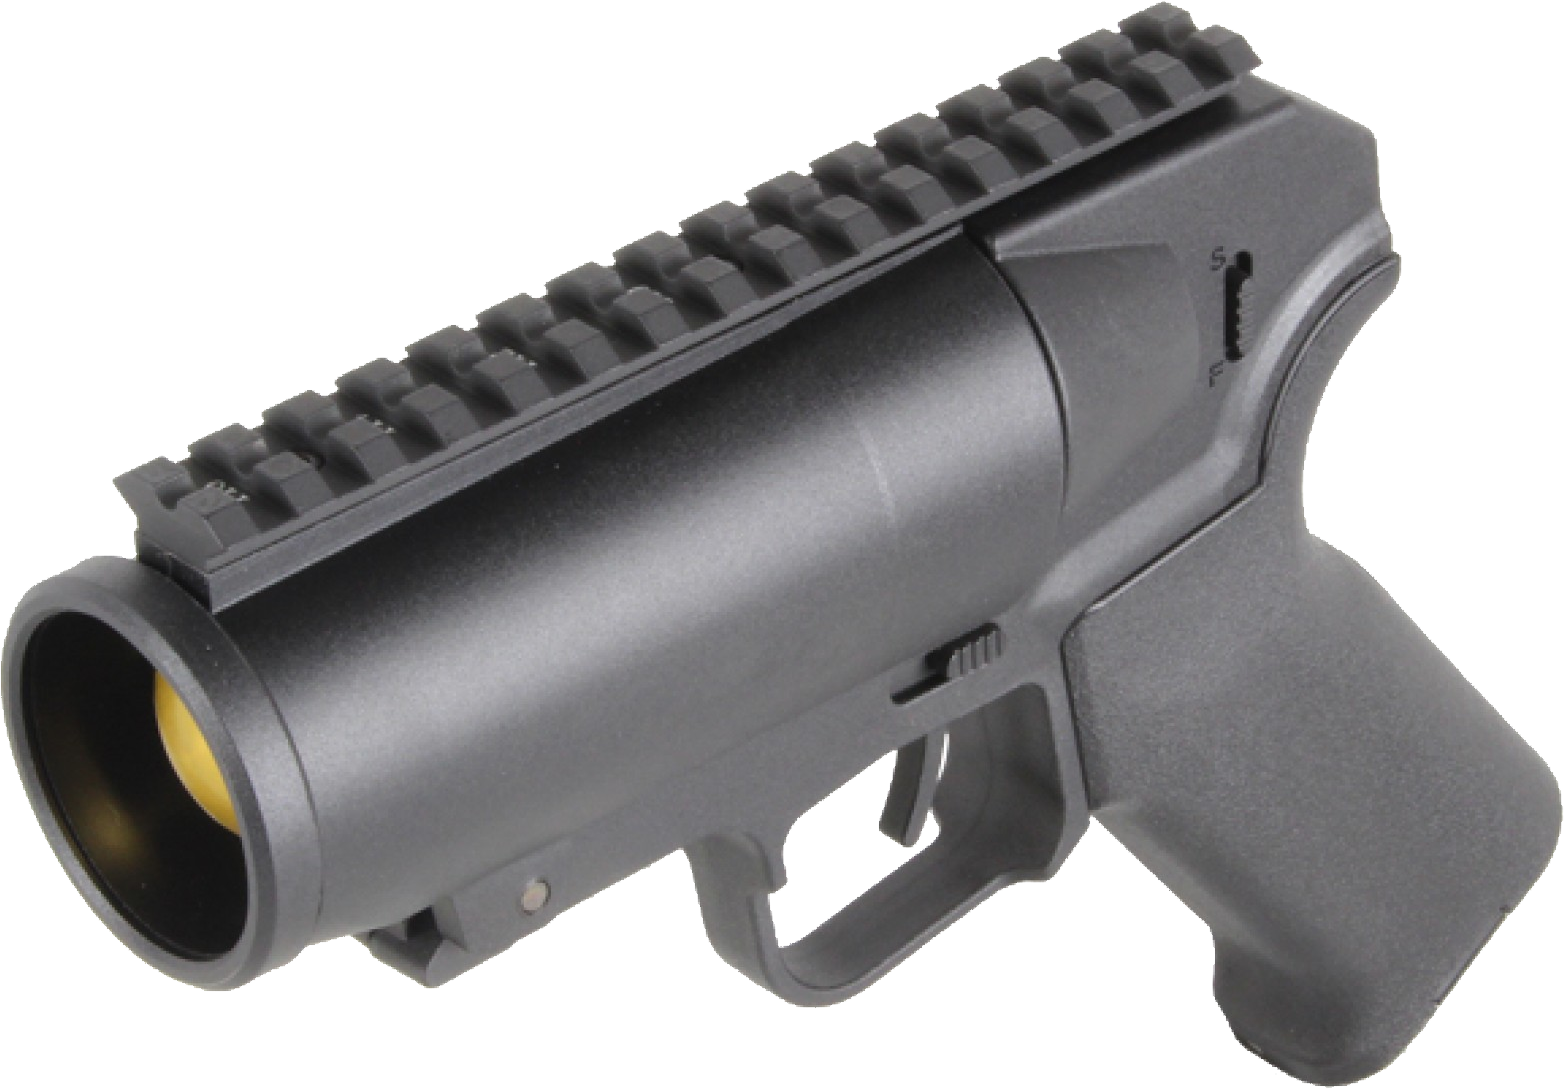 Types Of Motor >> grenade launcher PNG